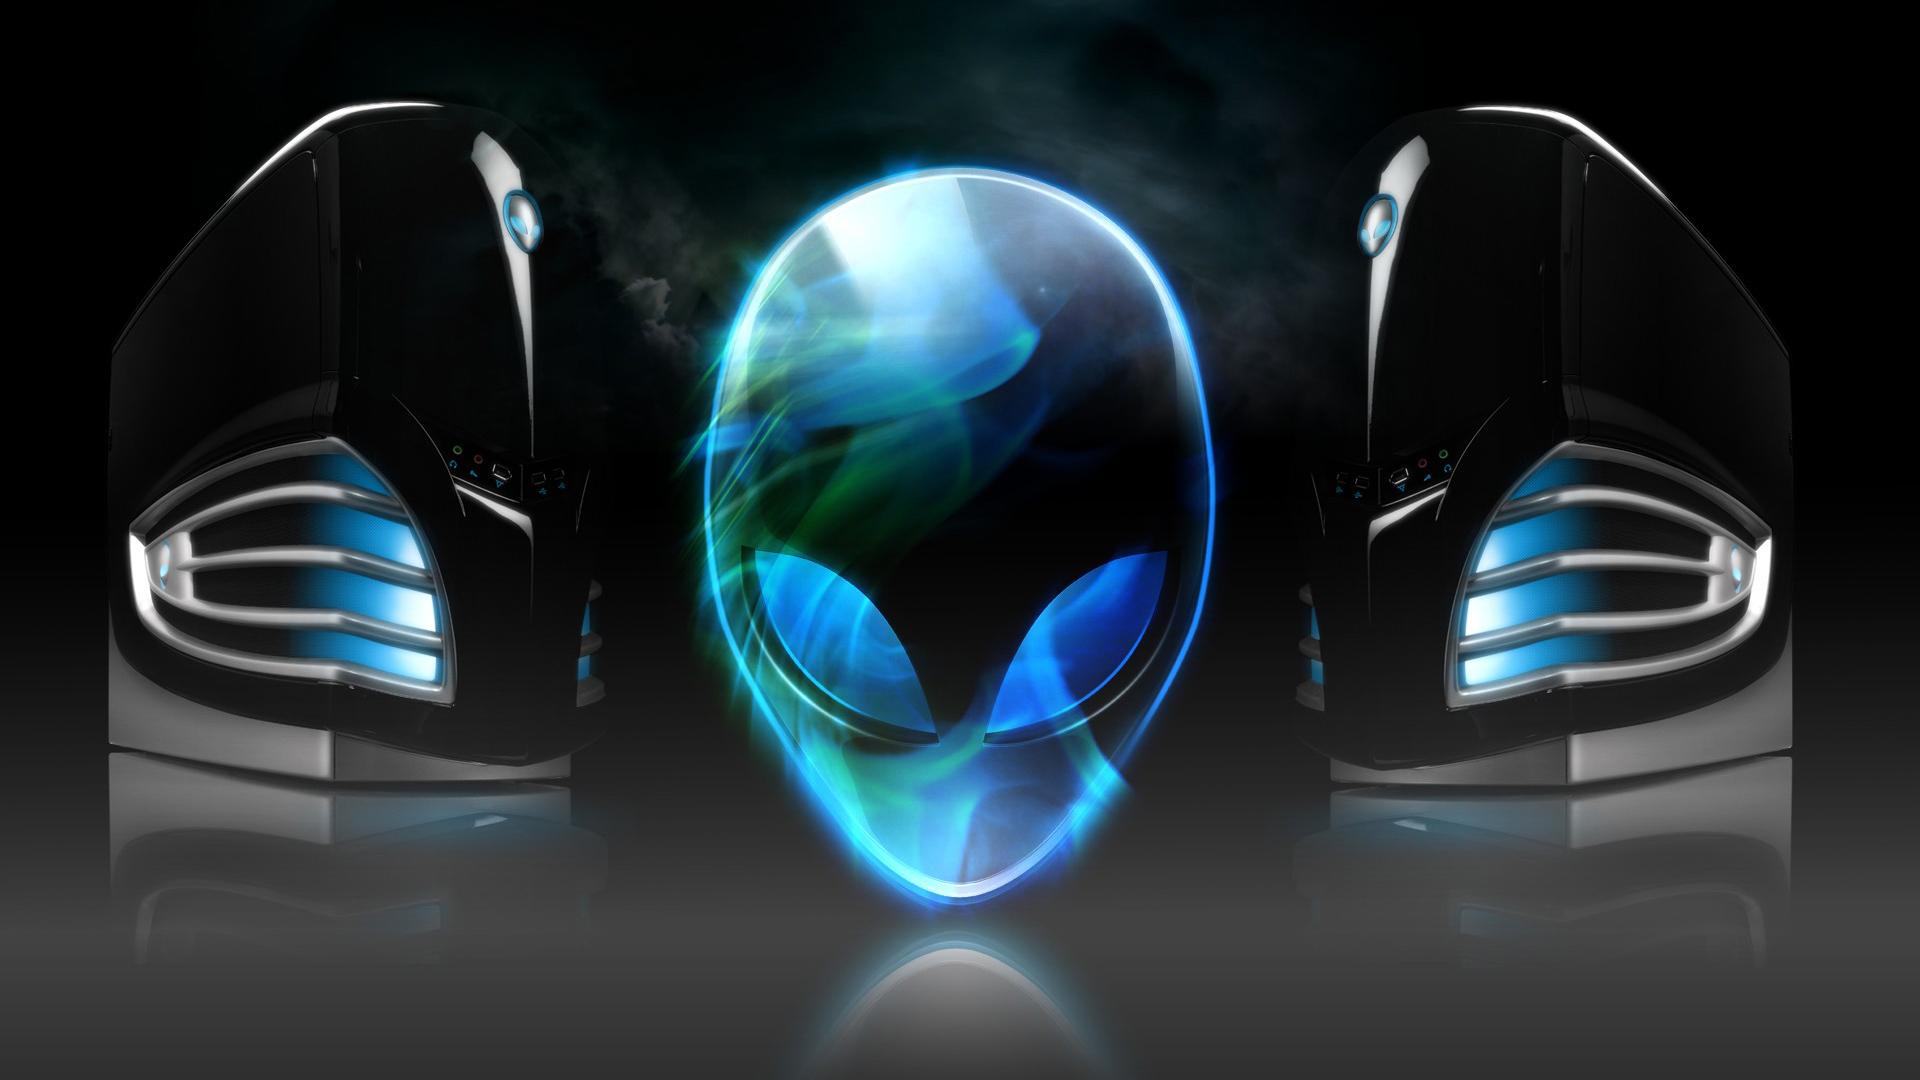 Super Alienware Wallpaper 1080p - WallpaperSafari #IG_62